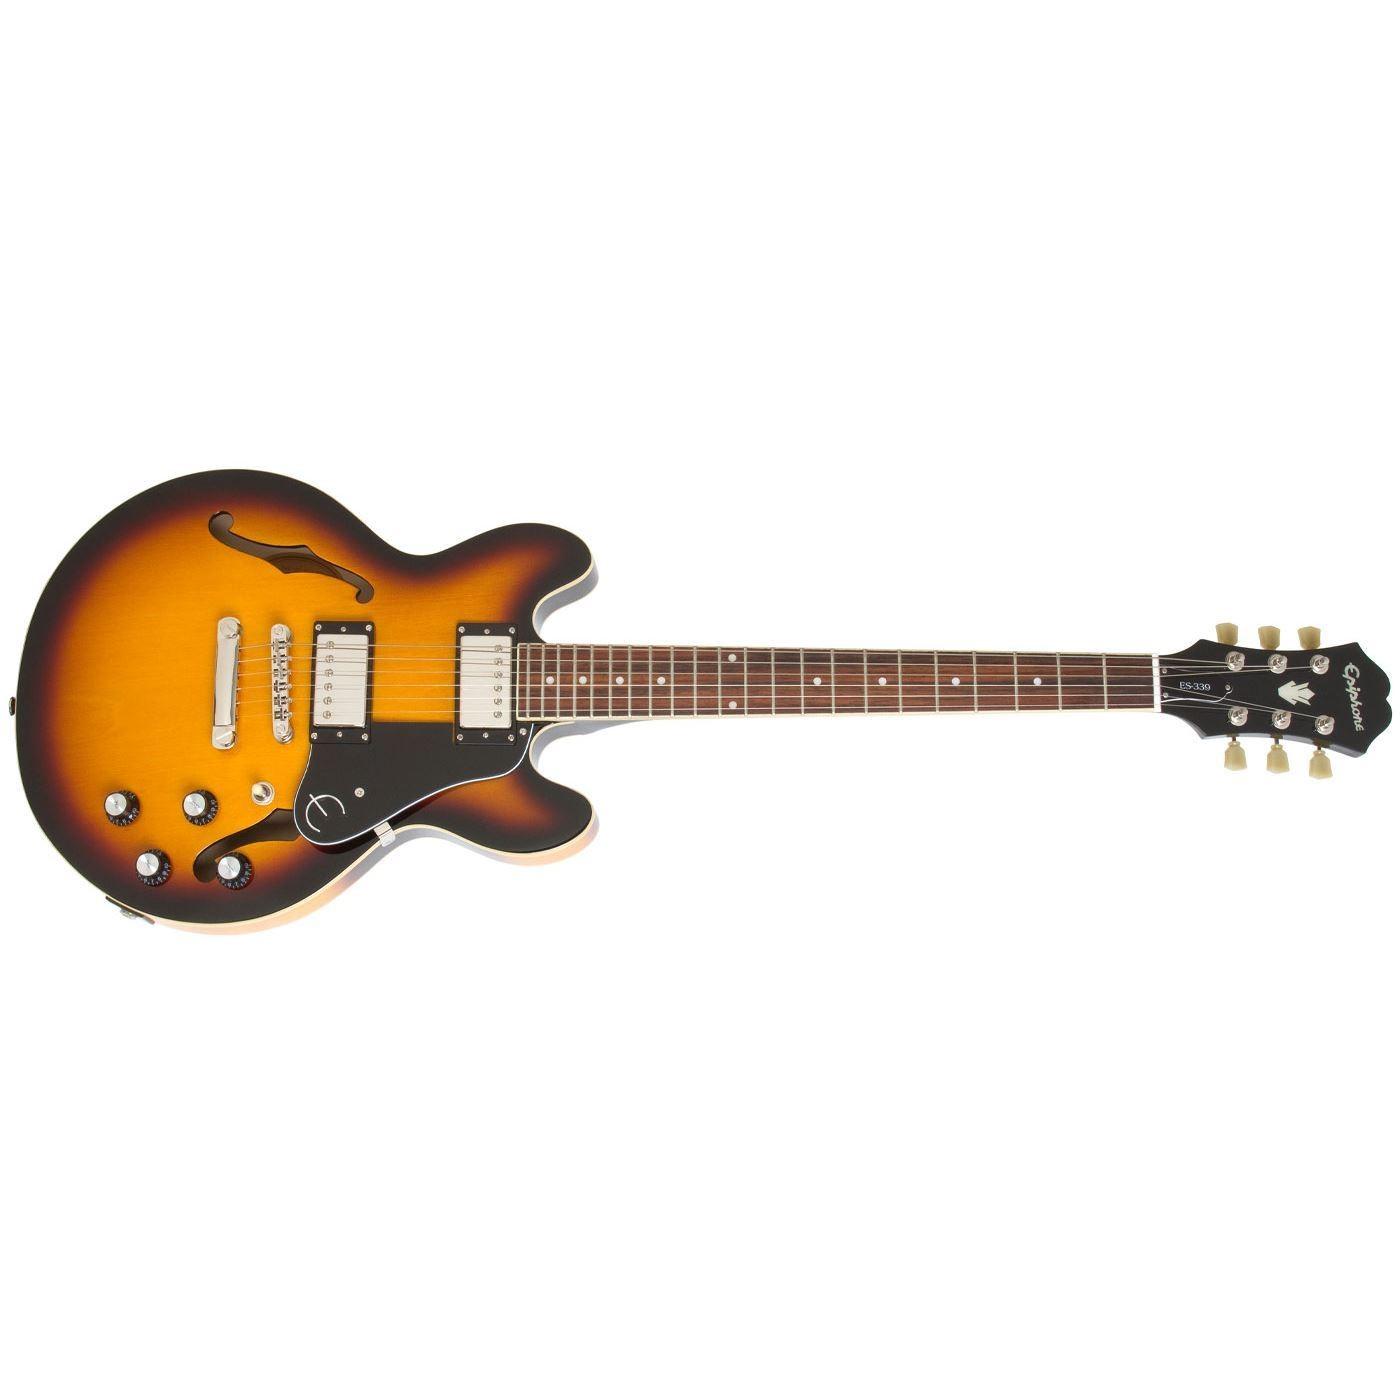 0022585 epiphone es339 electric guitar vintage sunburst - Epiphone ES 339 PRO Vintage Sunburst